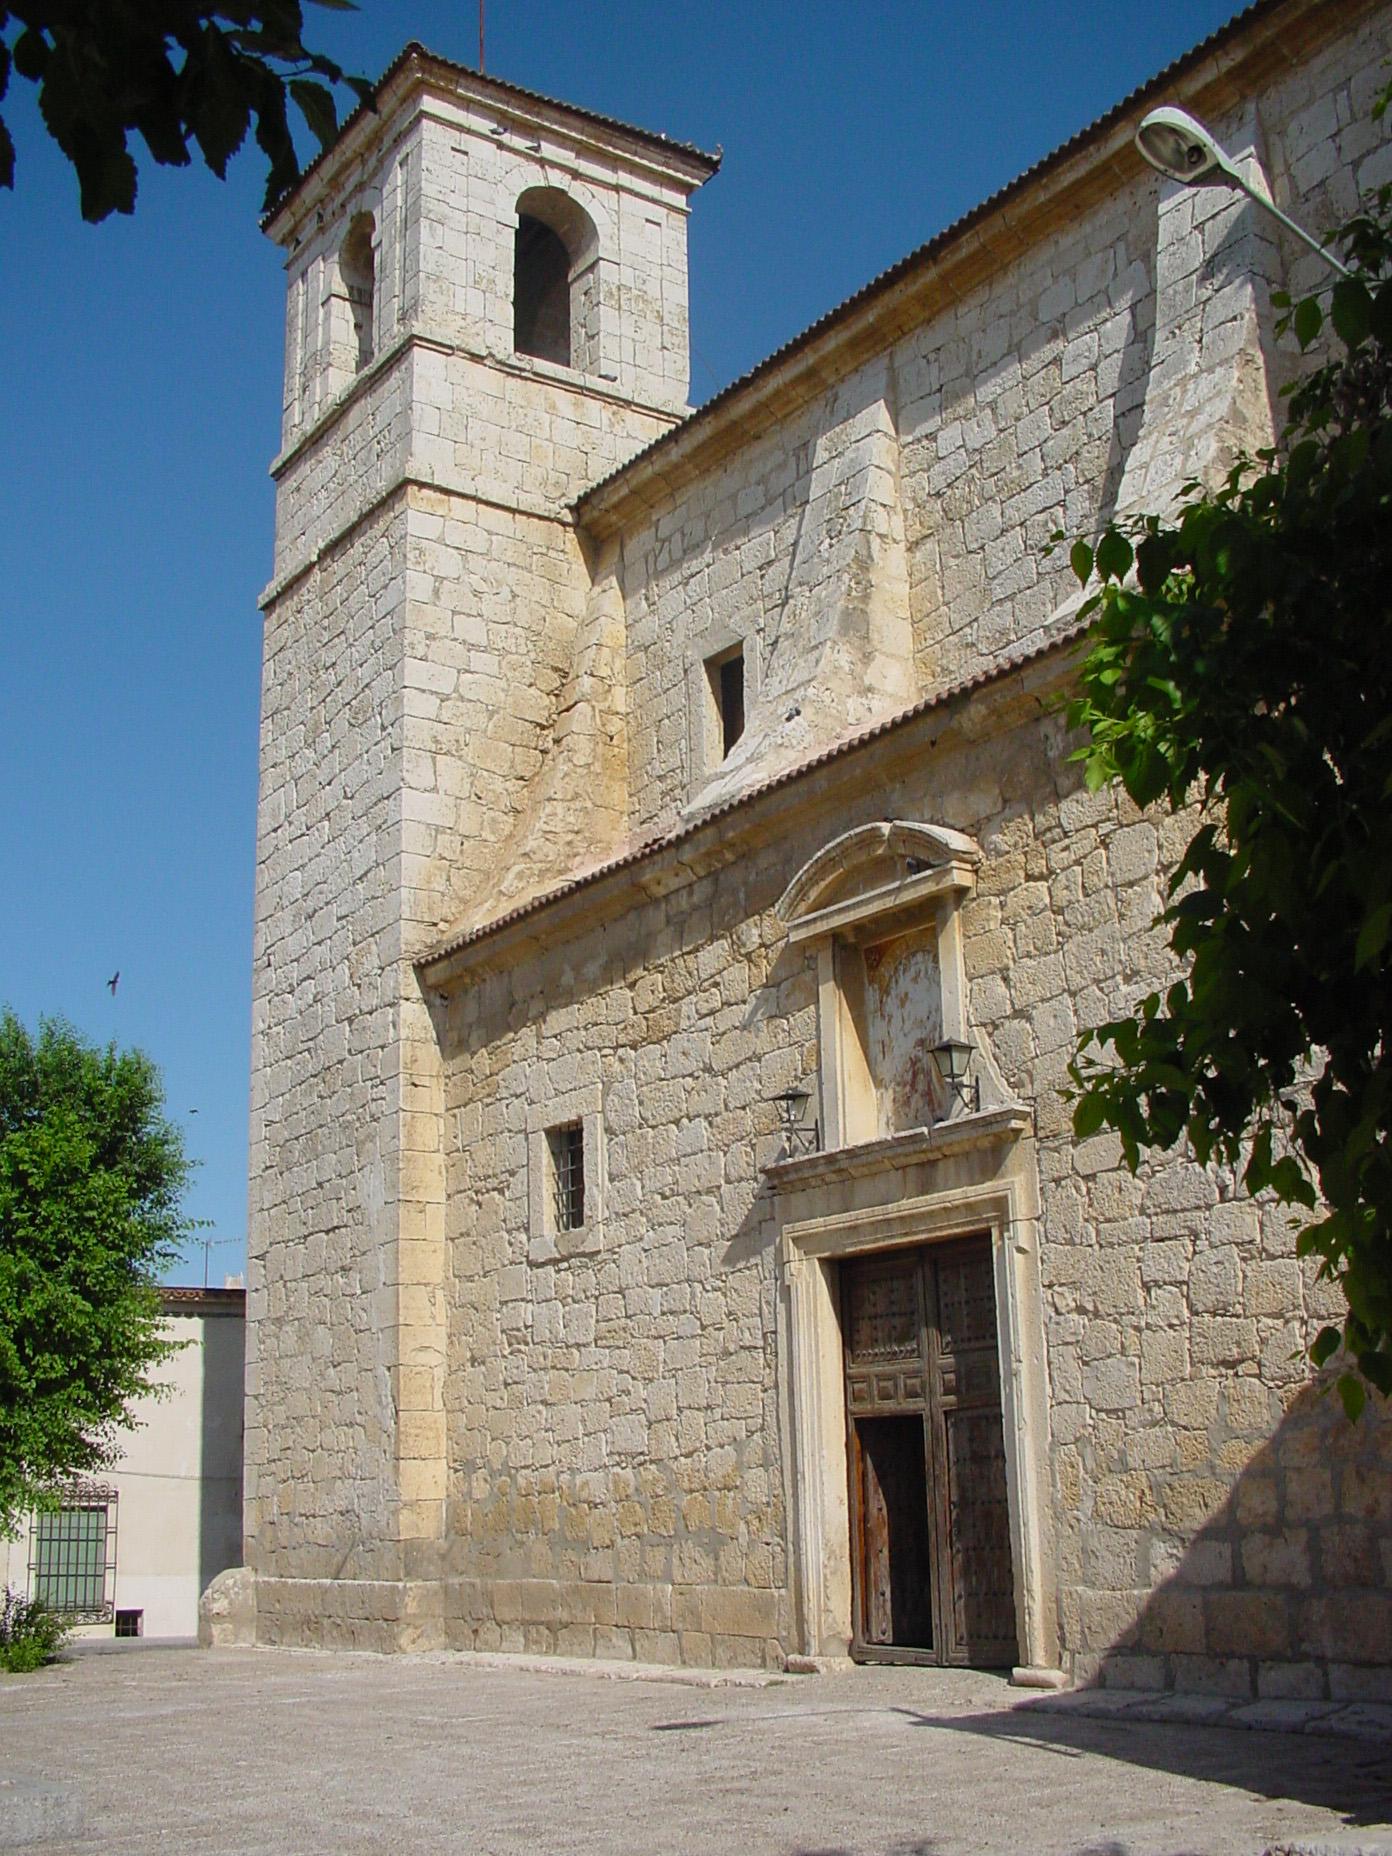 Vista de iglesia en Villaconejos